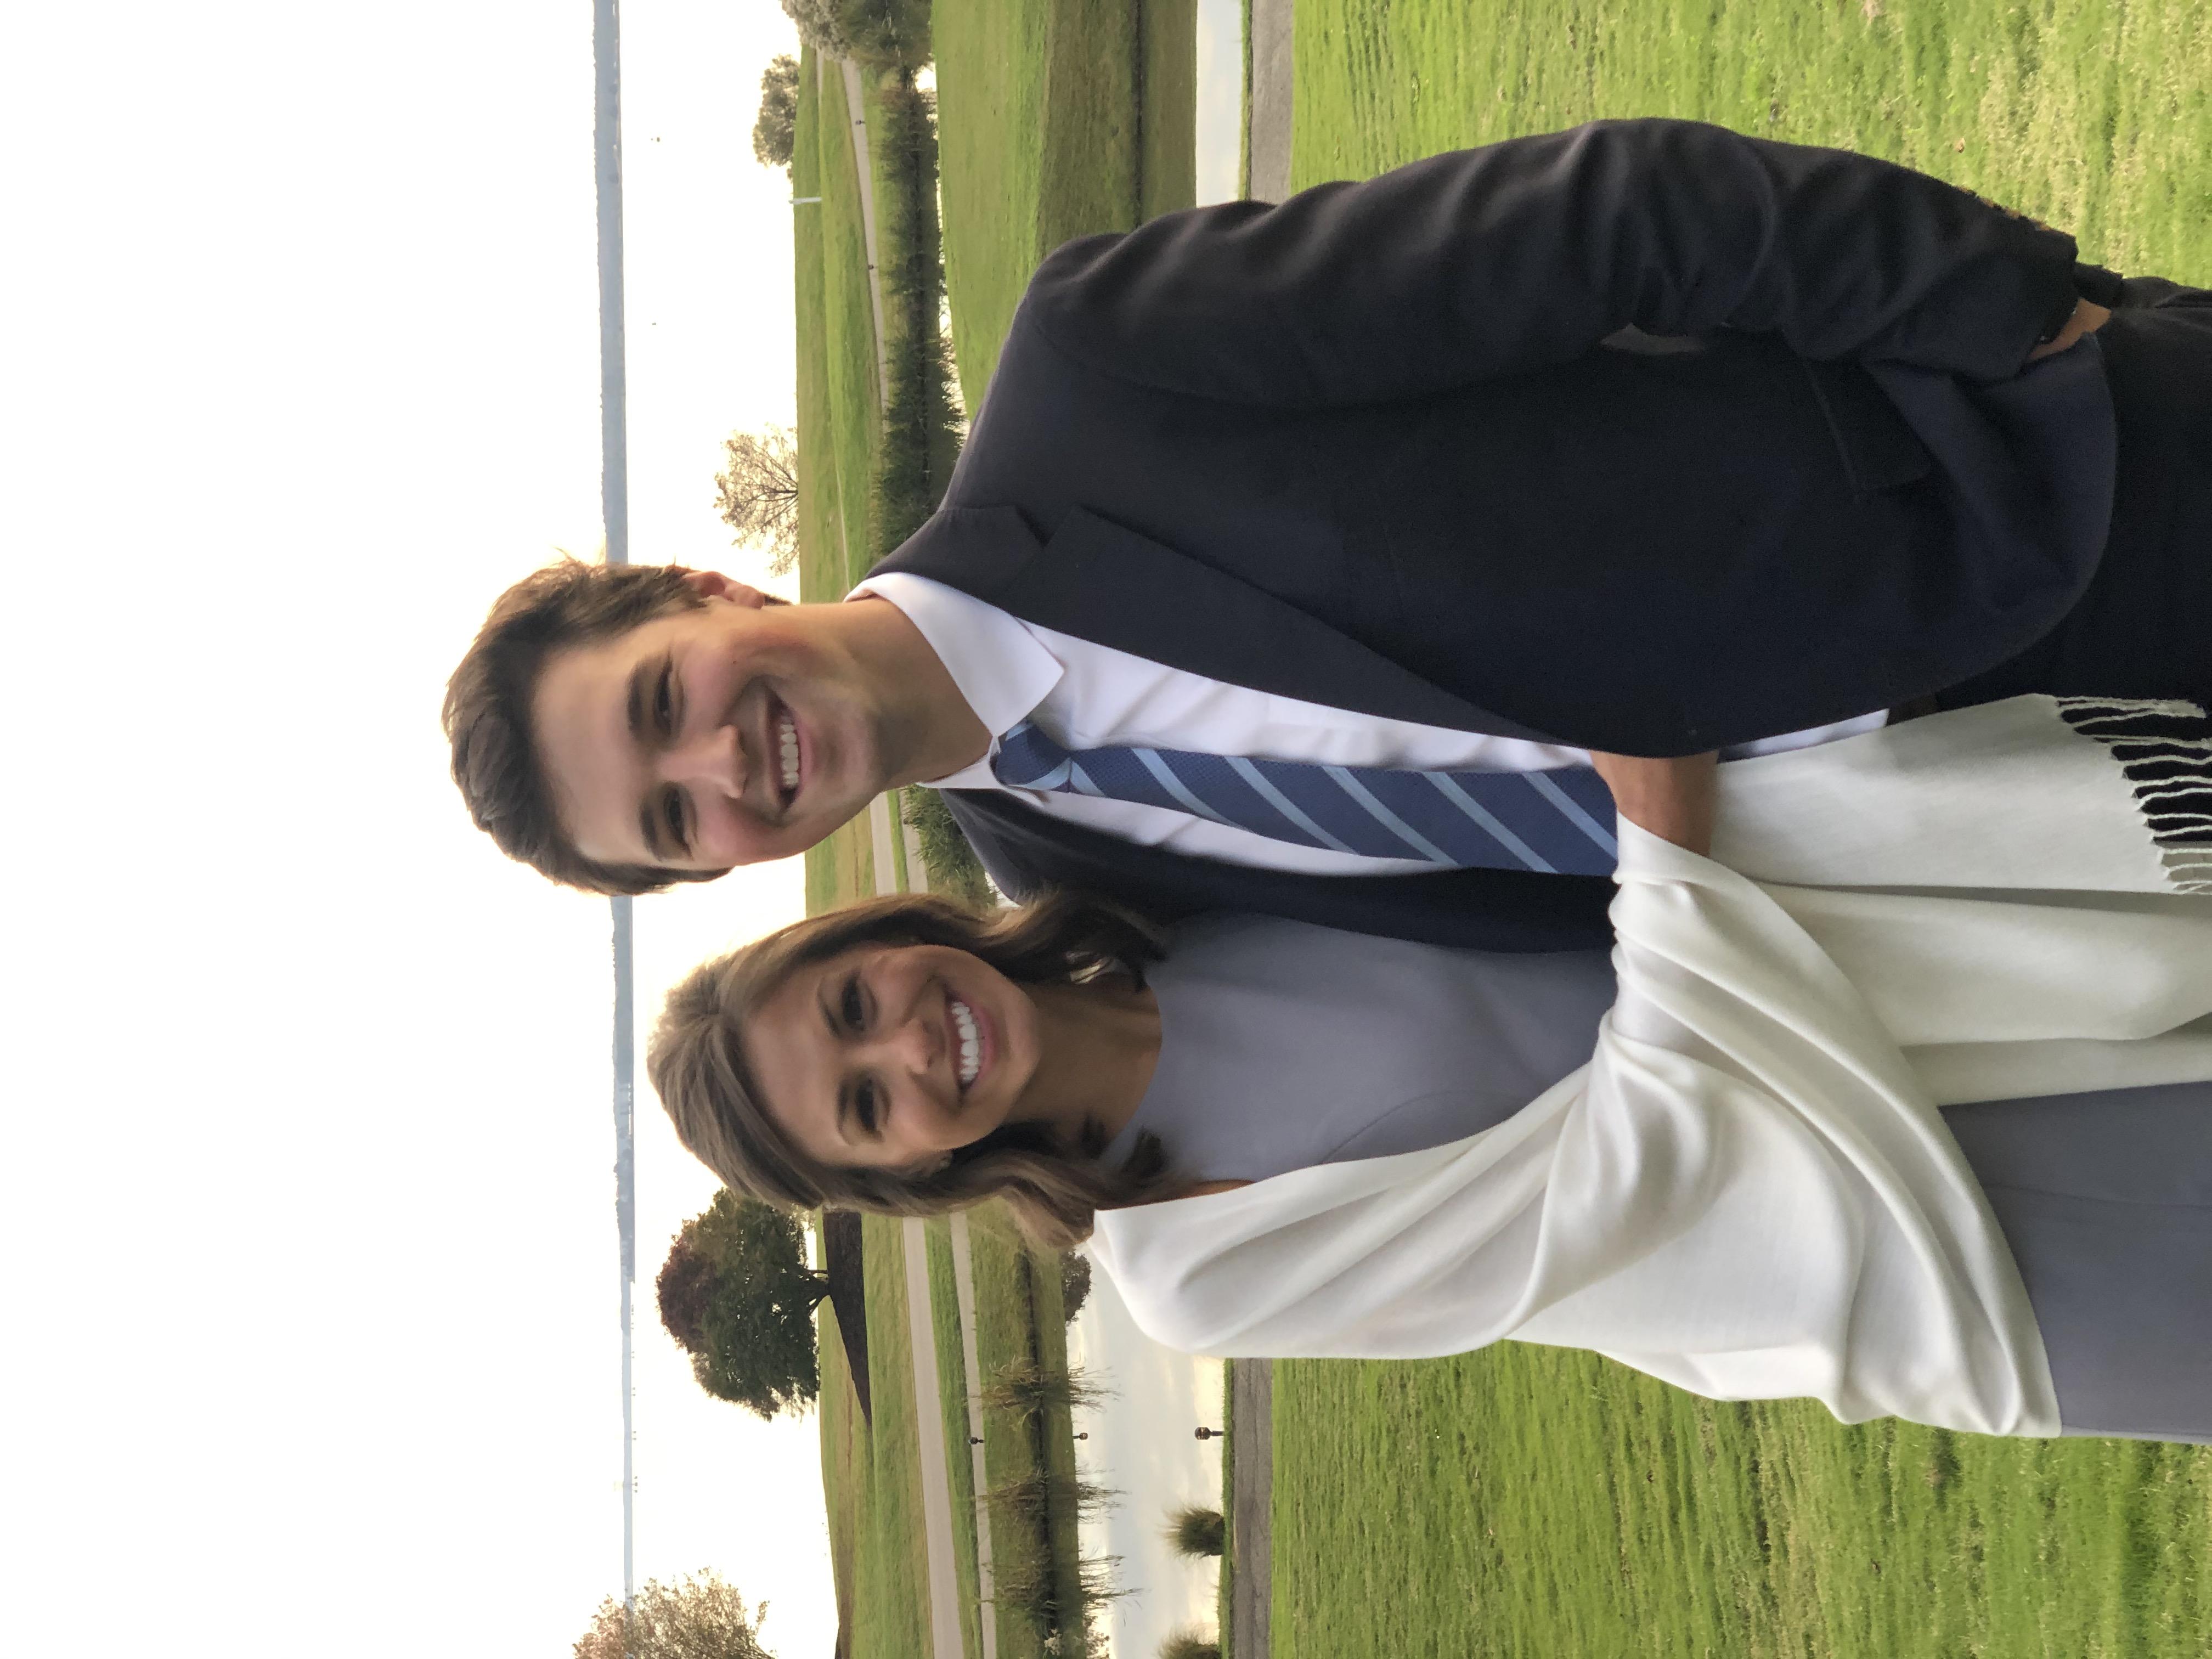 Meredith Napoleon and Evan Harrison